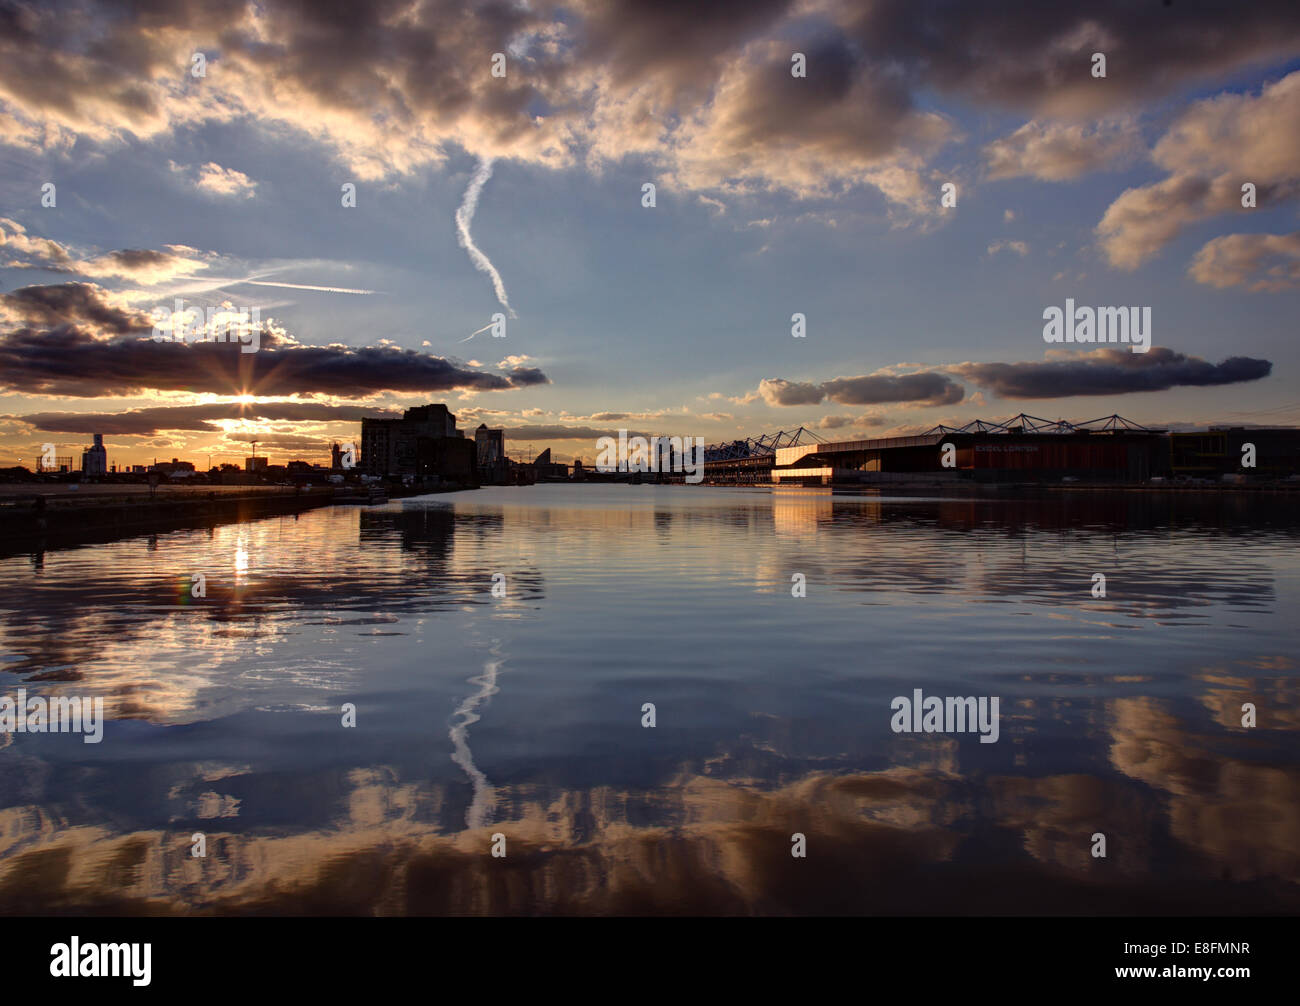 Royaume-uni, Angleterre, Londres, Royal Victoria Docks à Canary Wharf Photo Stock